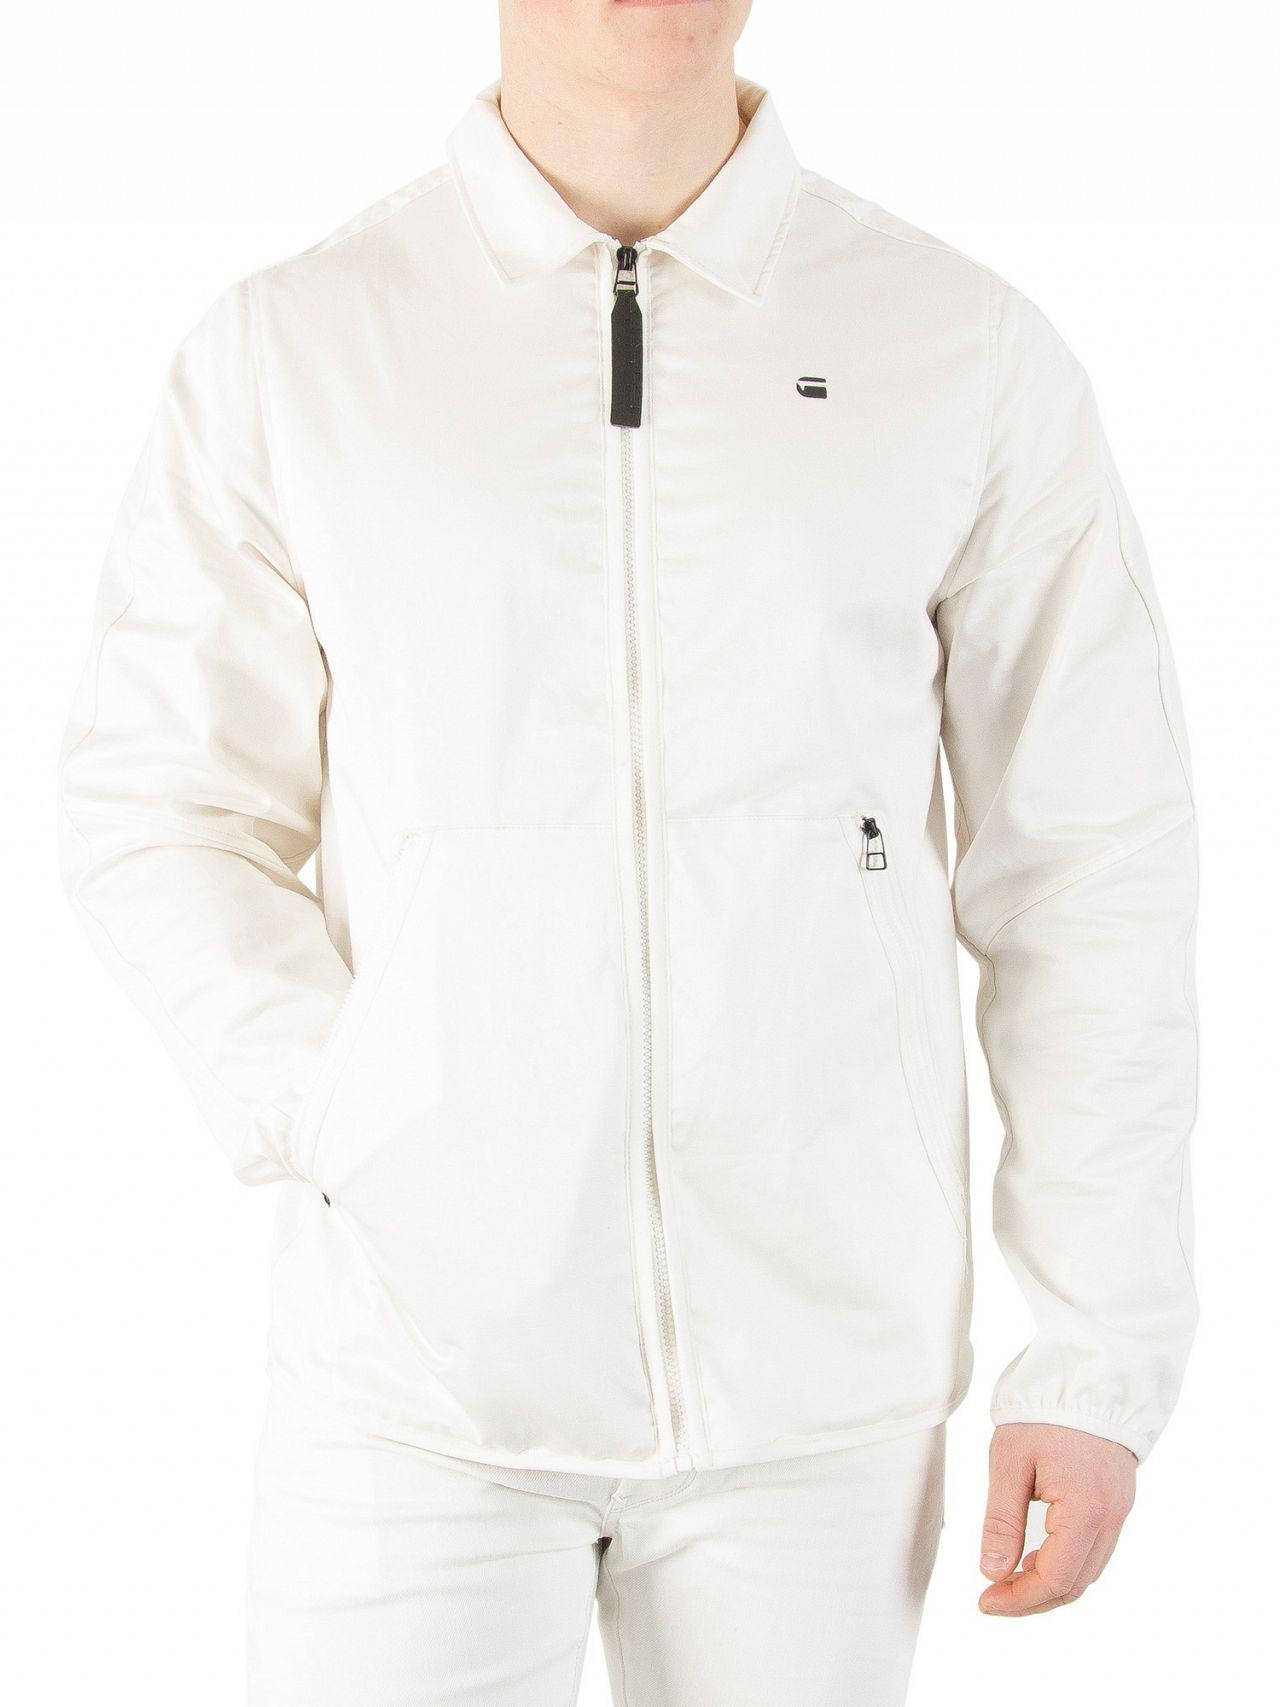 34c0a7153874 G-Star RAW Milk Strett Coach Overshirt Jacket in White for Men - Lyst